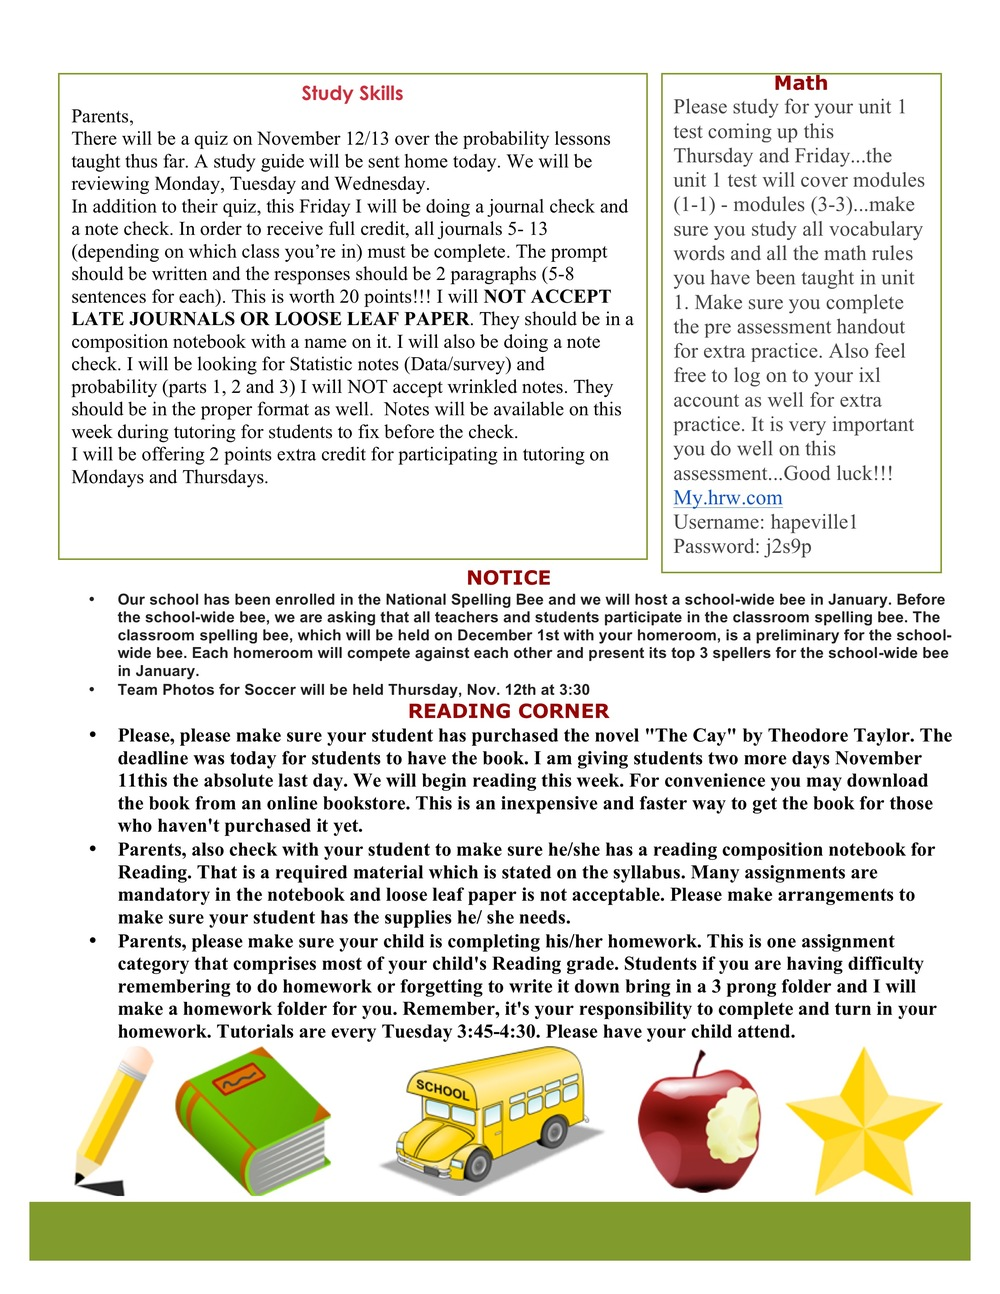 Newsletter Image7th grade Nov 9 2.jpeg